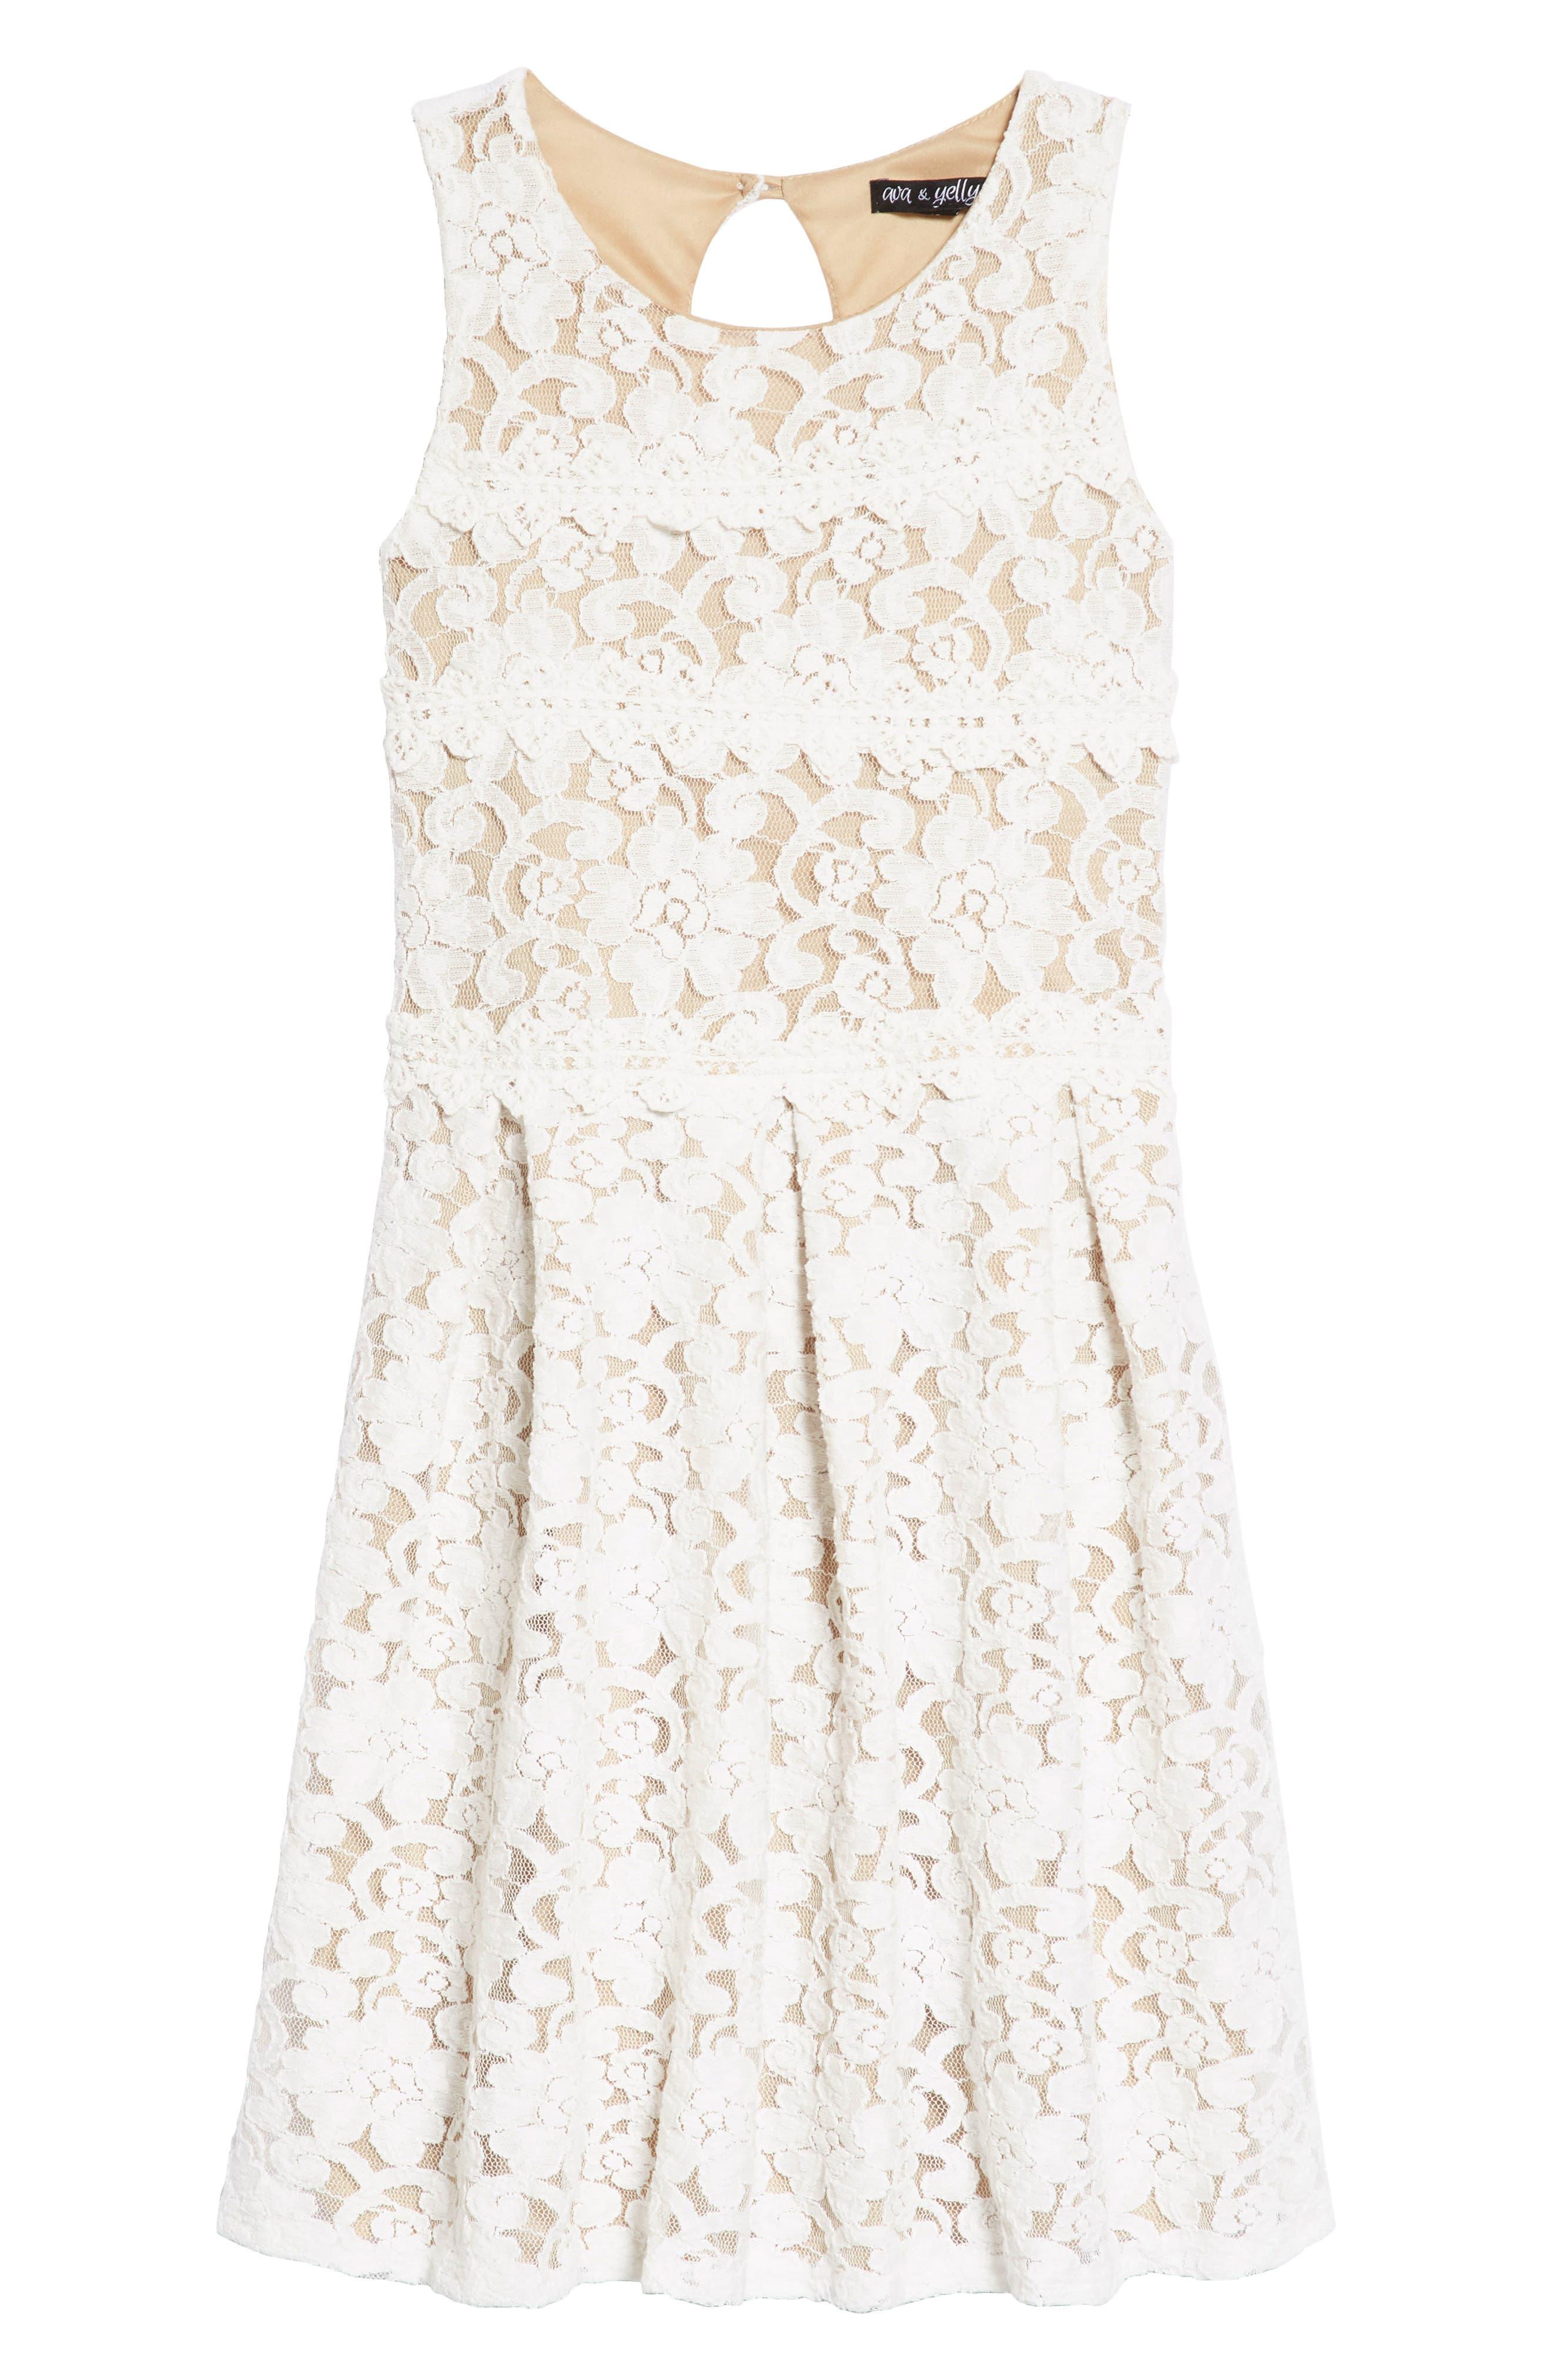 Two Tone Lace Skater Dress,                             Main thumbnail 1, color,                             Ivory/ Tan